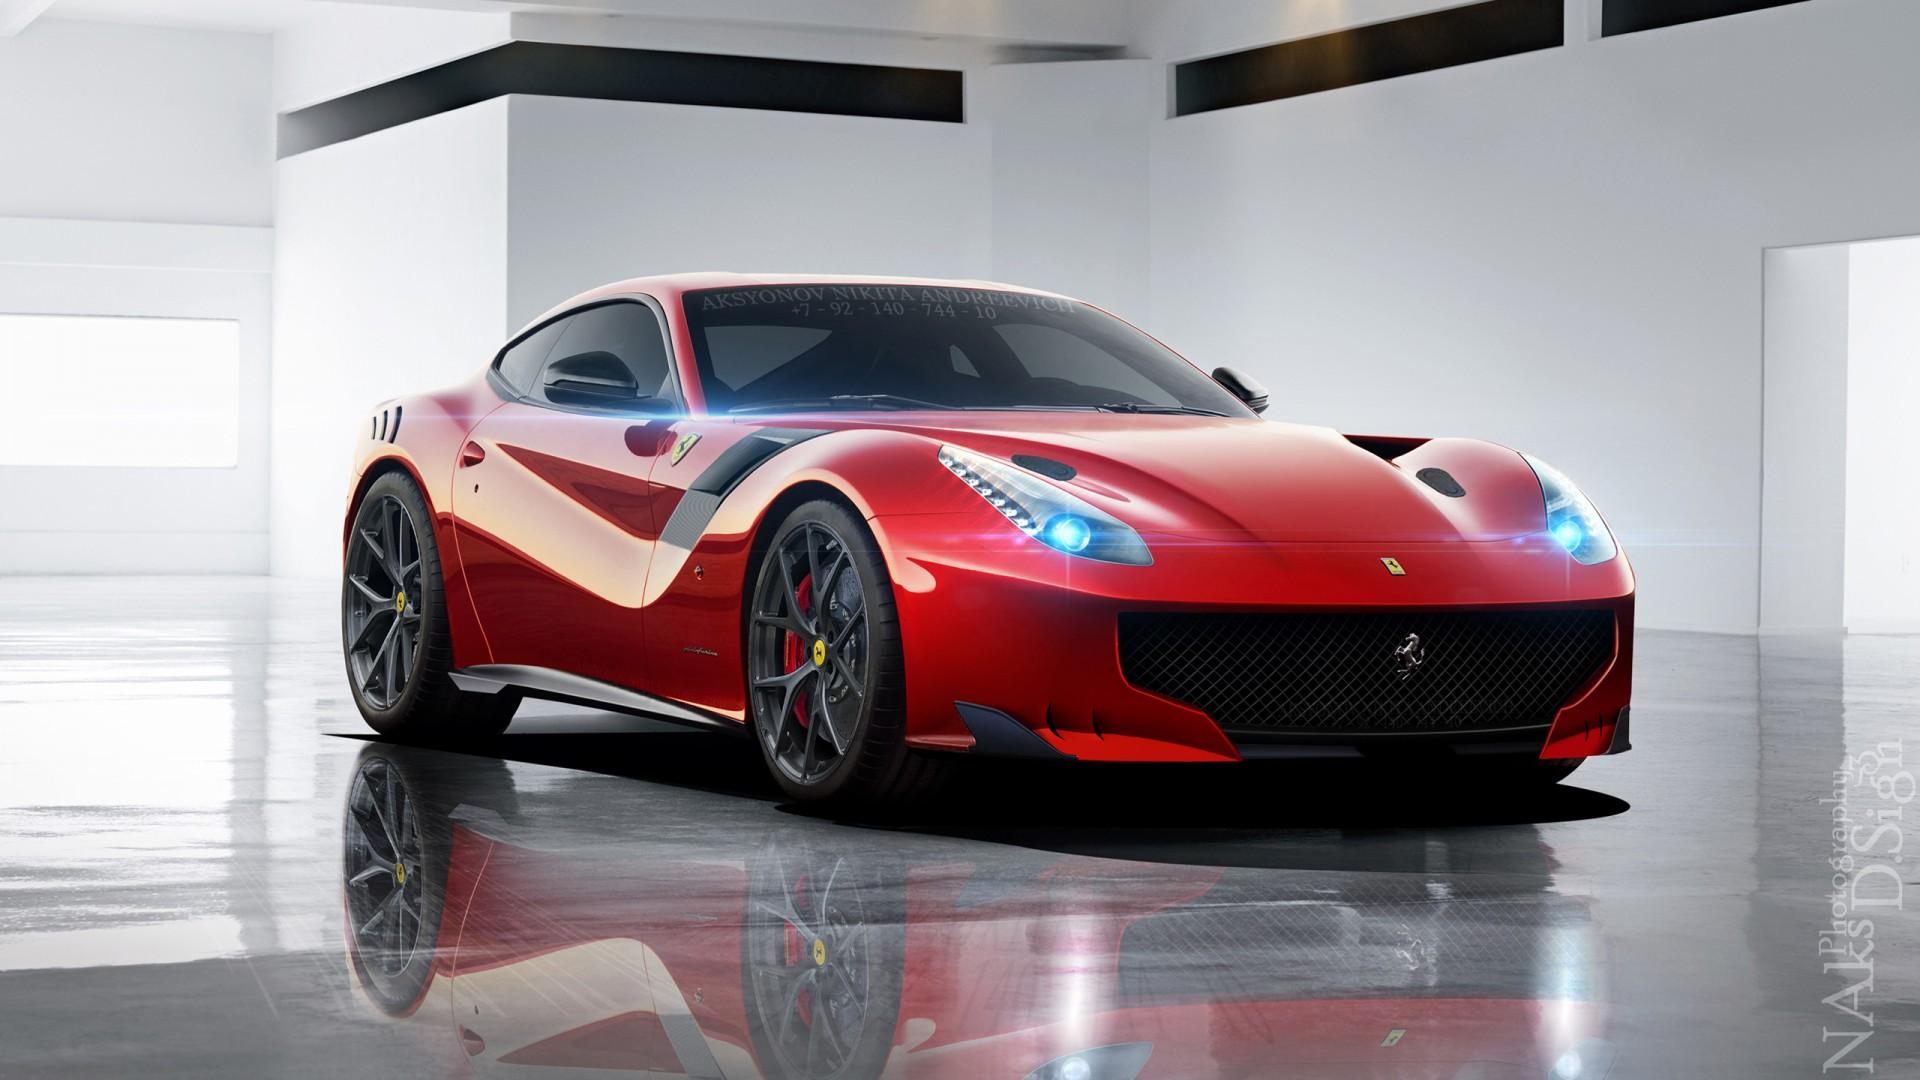 Gto Muscle Car Wallpaper Ferrari F12 Gto Wallpaper Hd Car Wallpapers Id 5919